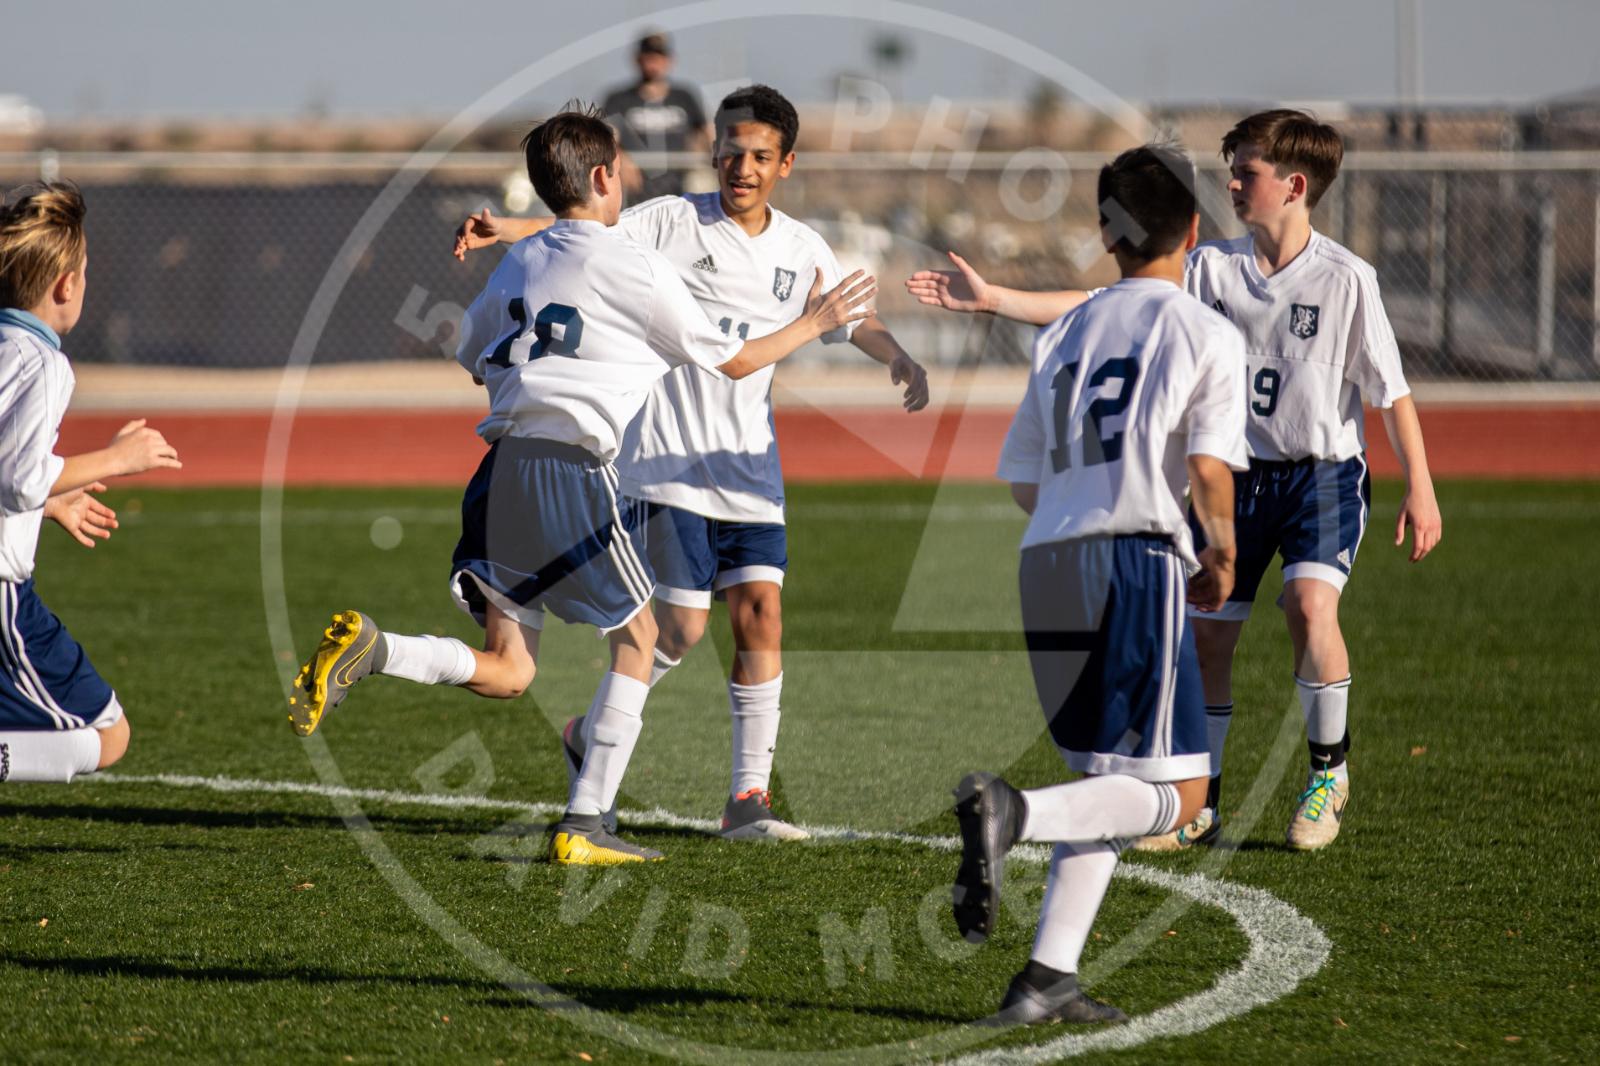 boys celebrate goal